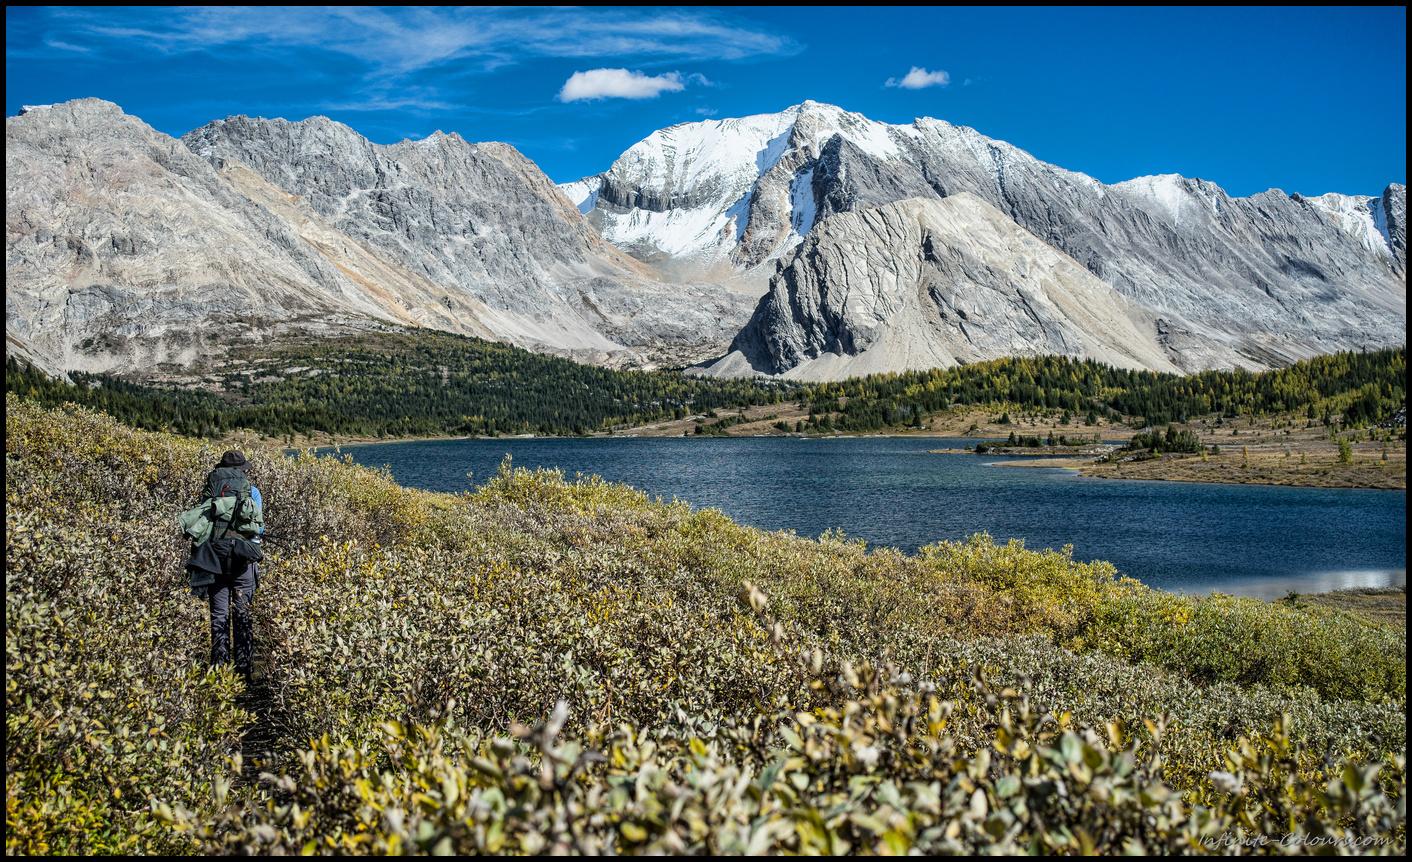 Hiking the bushtrail along Baker lake in the Skoki lakes section of Banff nationalpark